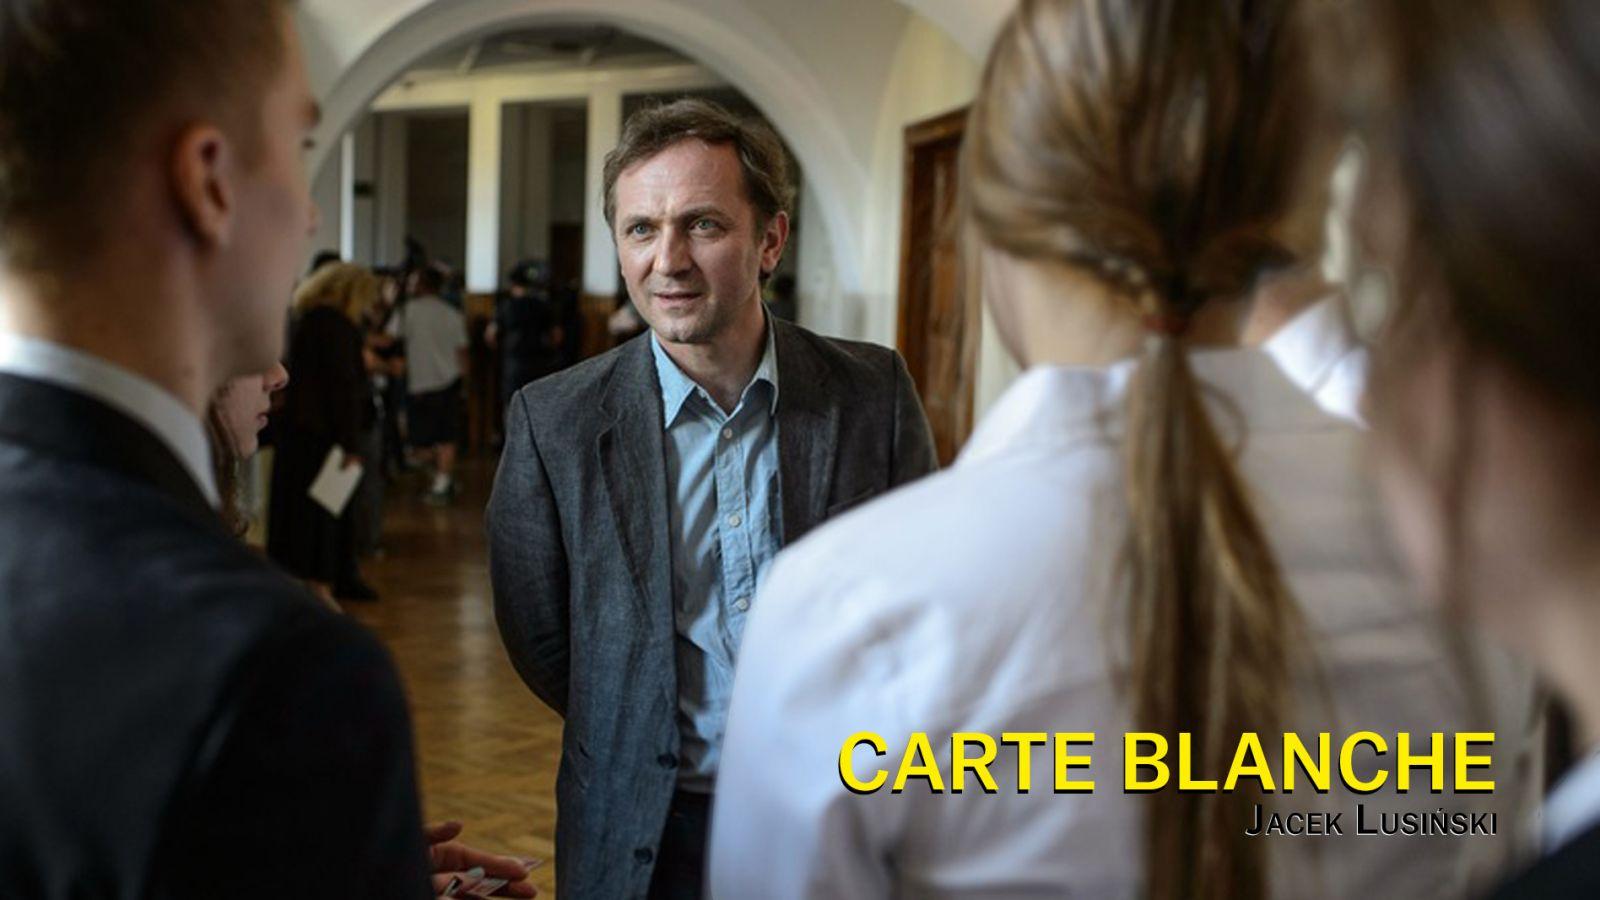 Carte blanche, Jacek Lusinski